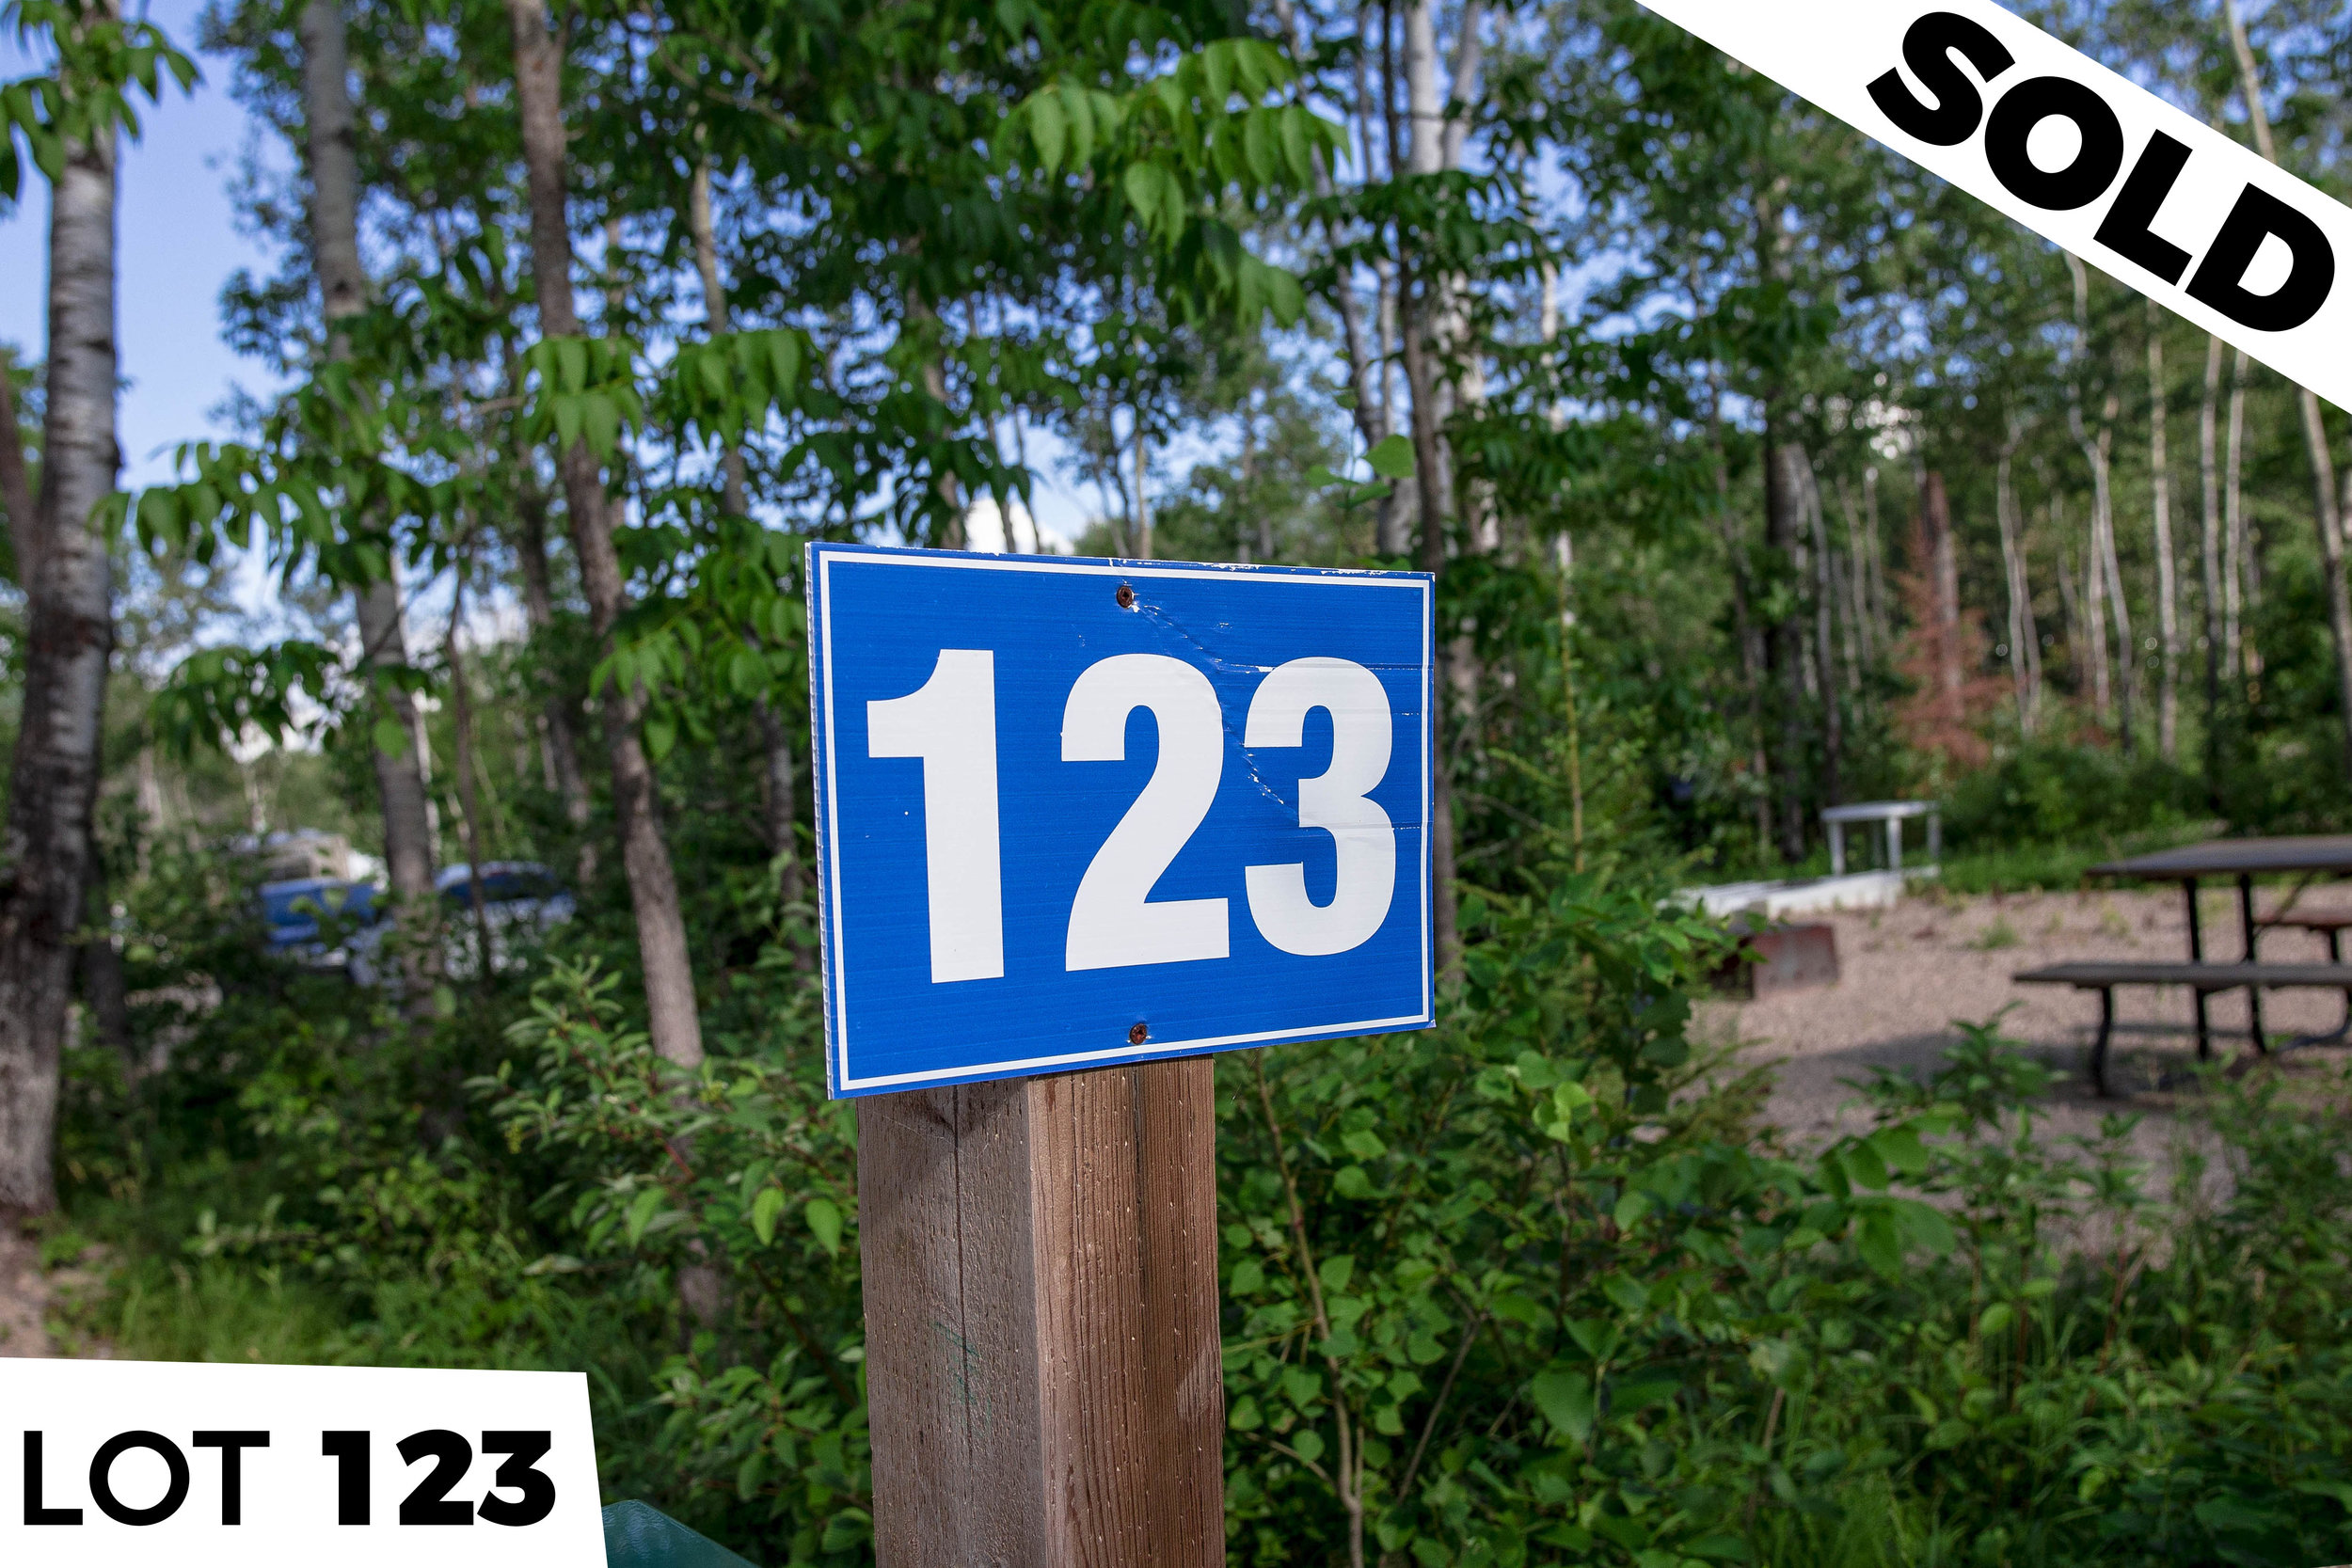 Grand Palms RV Resort - Lot #123